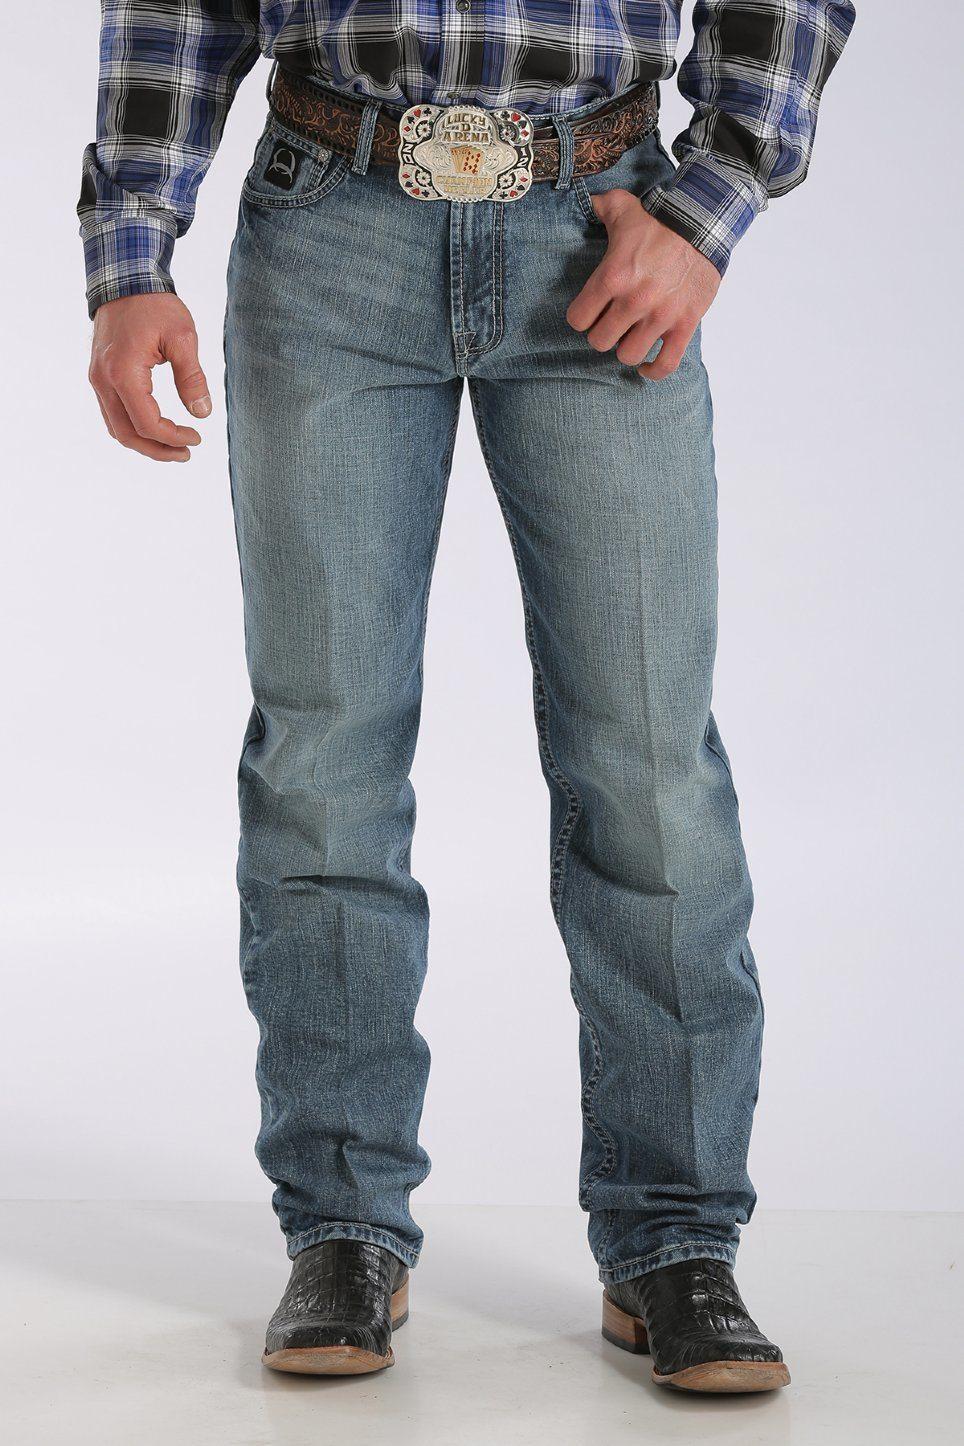 Calça Jeans Cinch Black Label 2.0 Importada Masculina